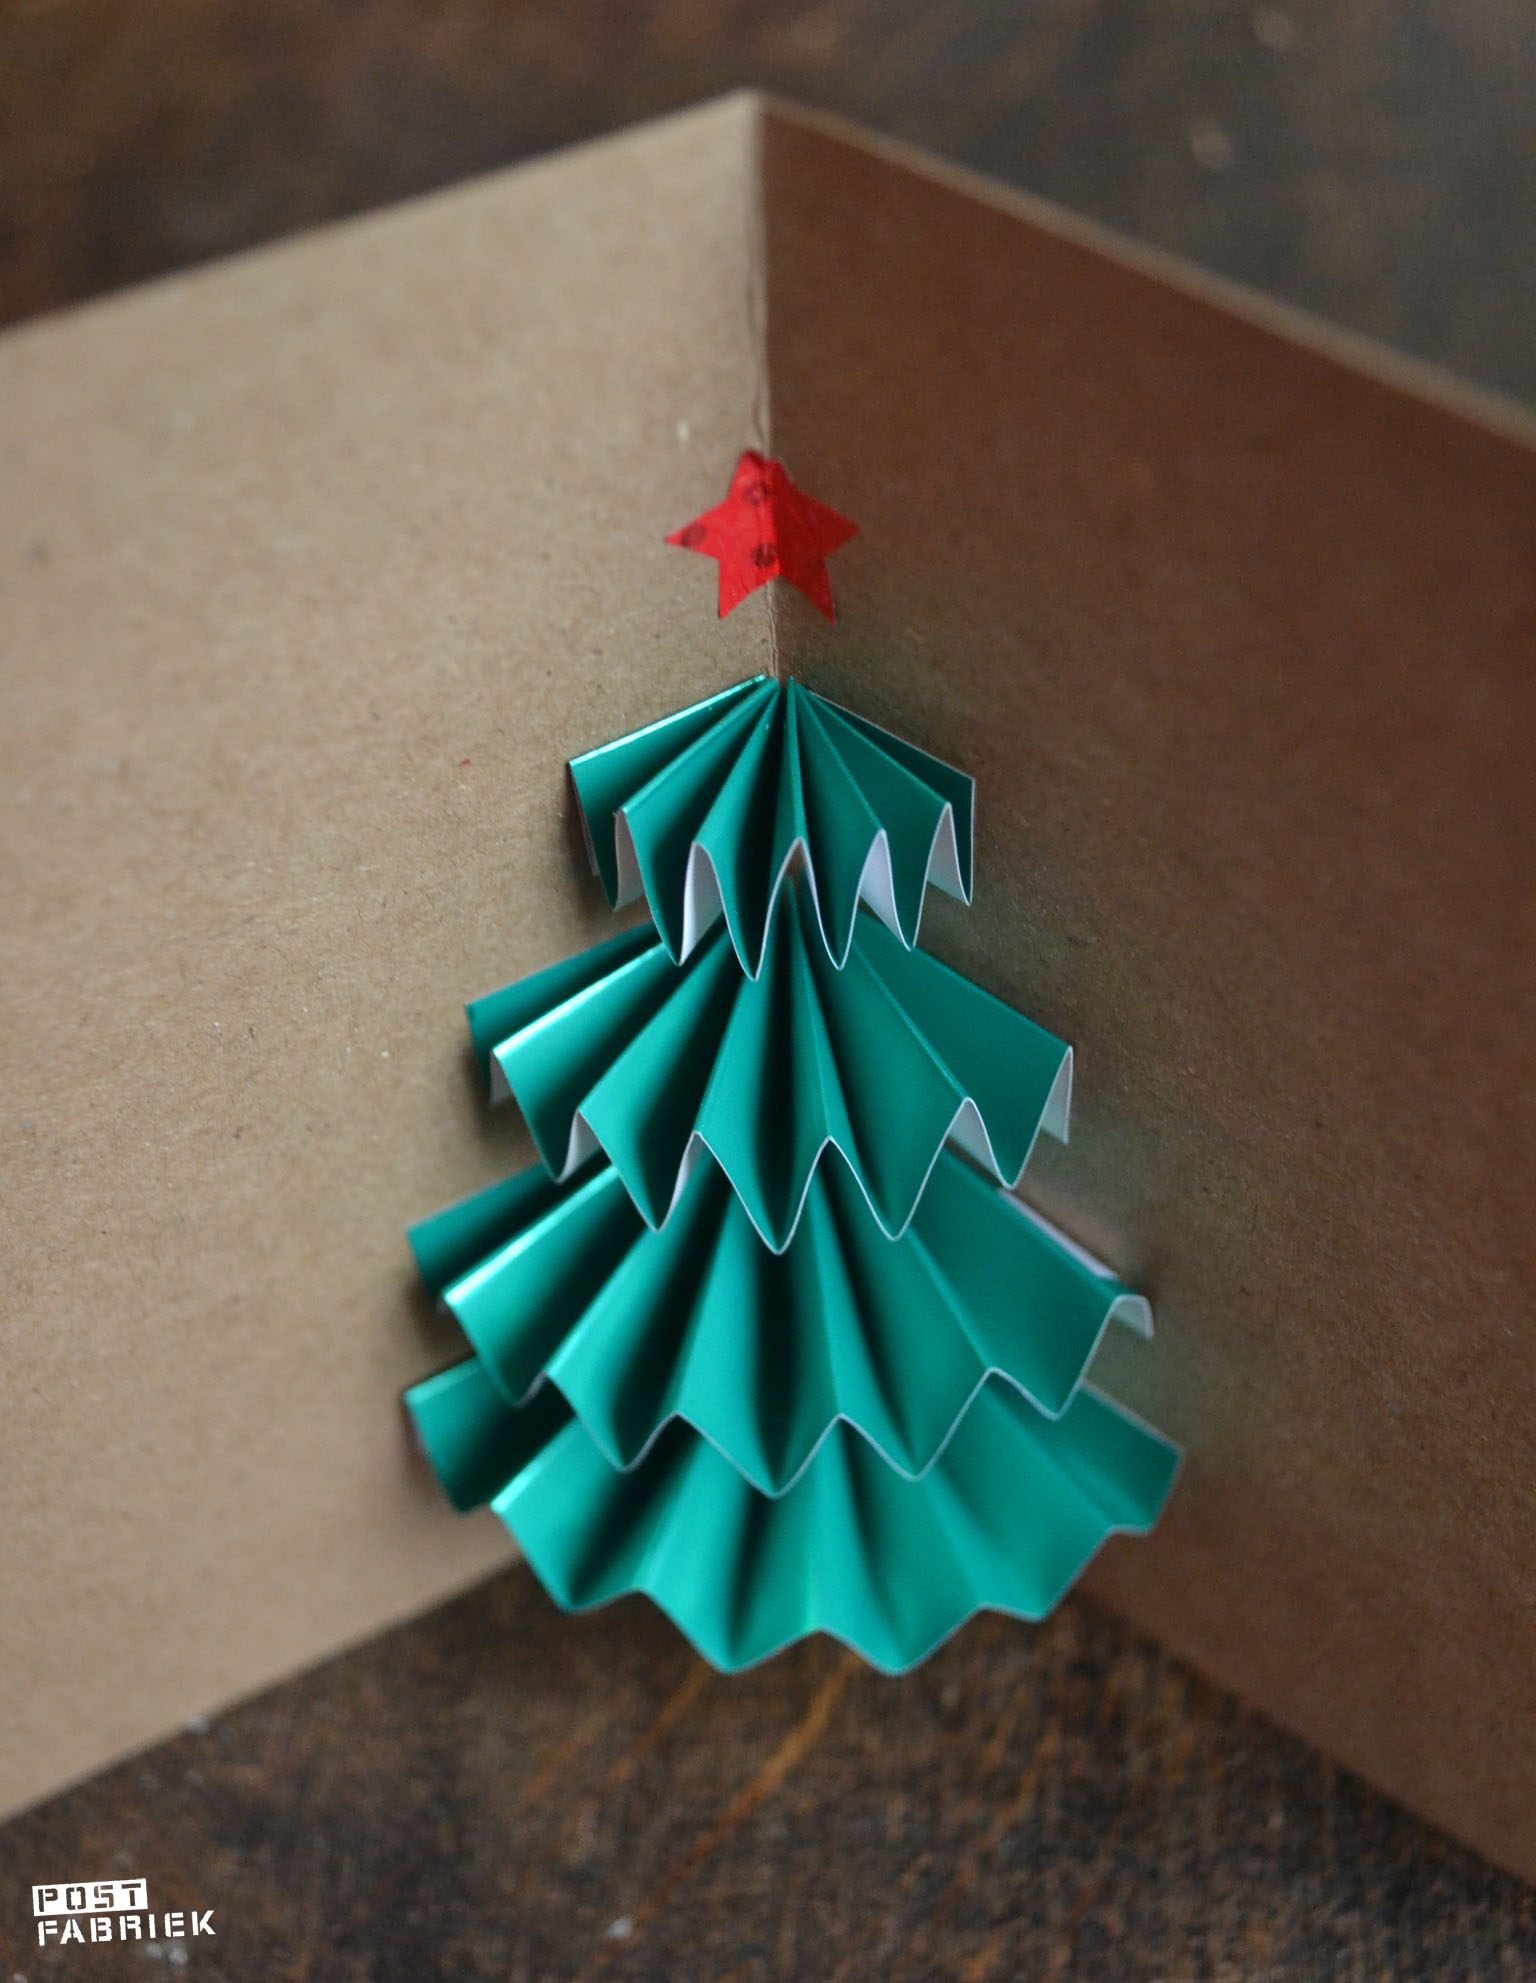 Wonderbaar kerstkaarten Archieven - Postfabriek AN-35